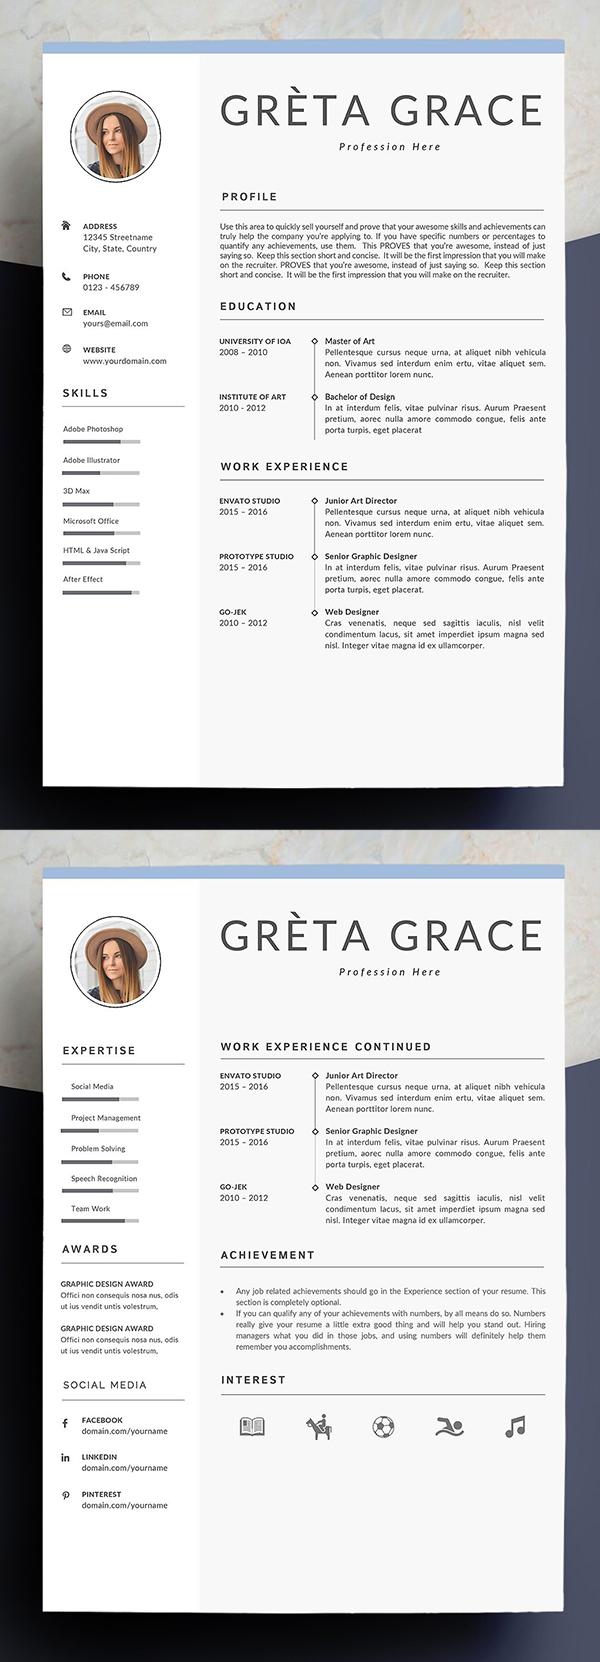 Professional Resume Template | Clove